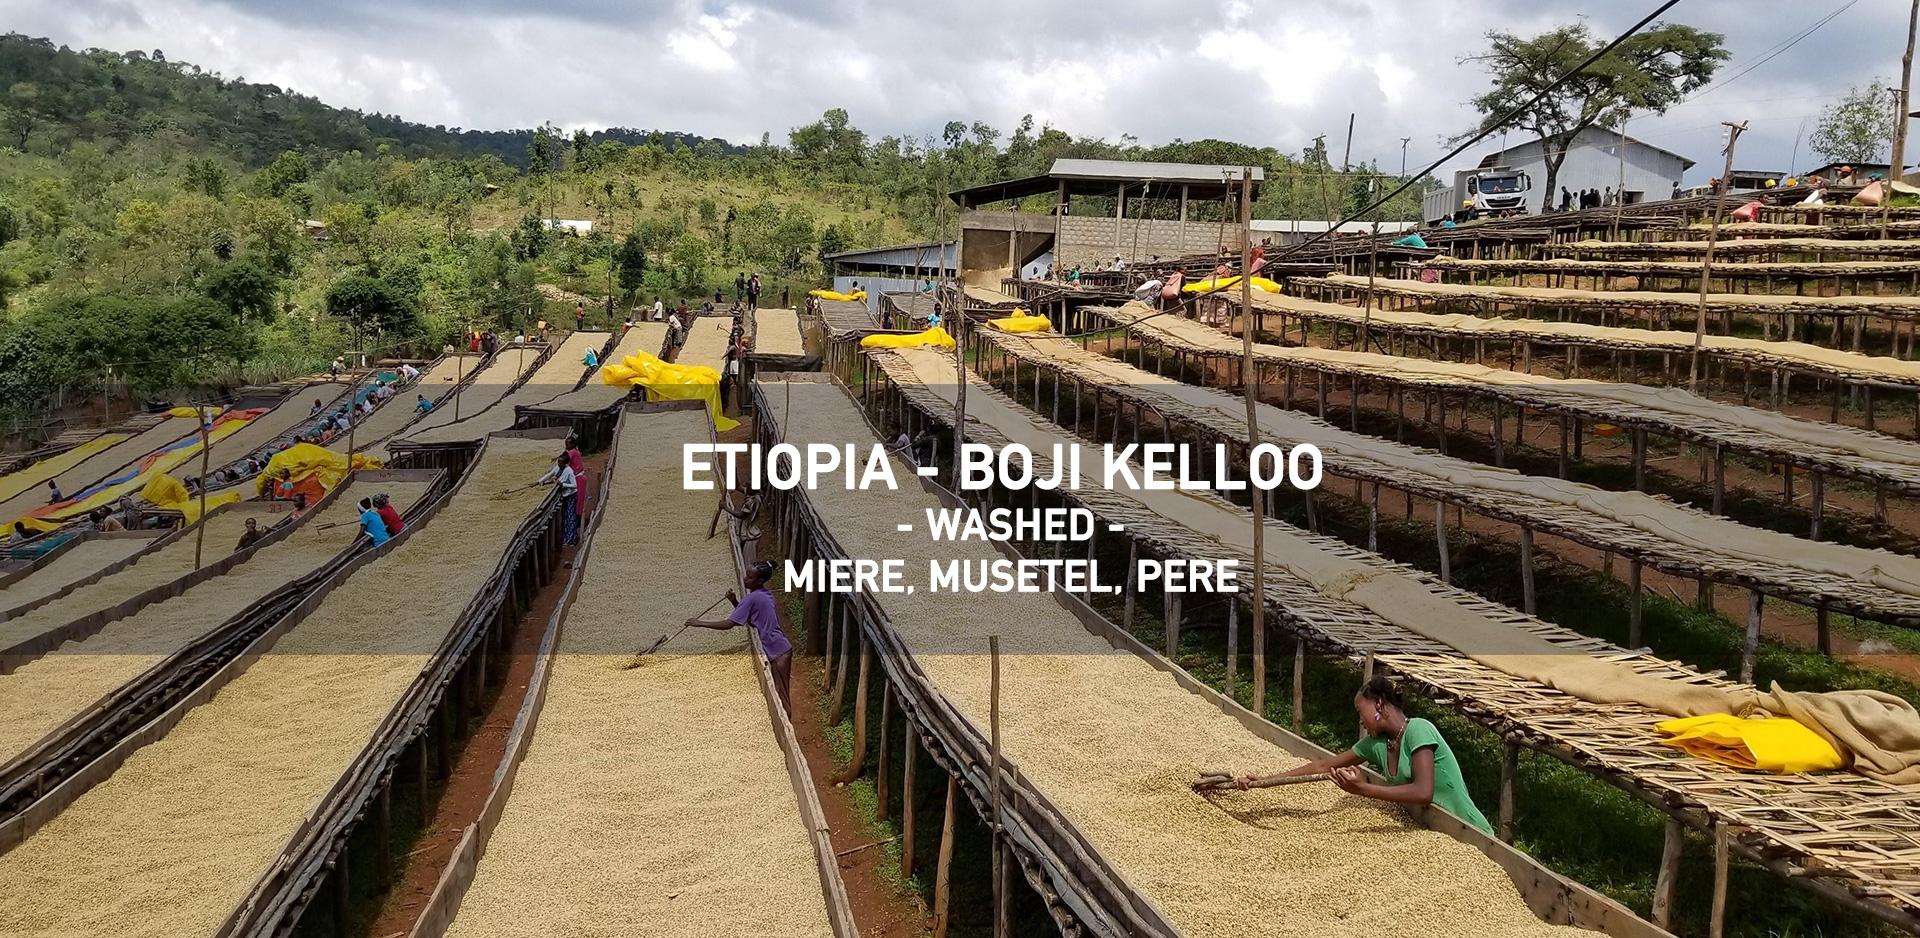 Etiopia Boji